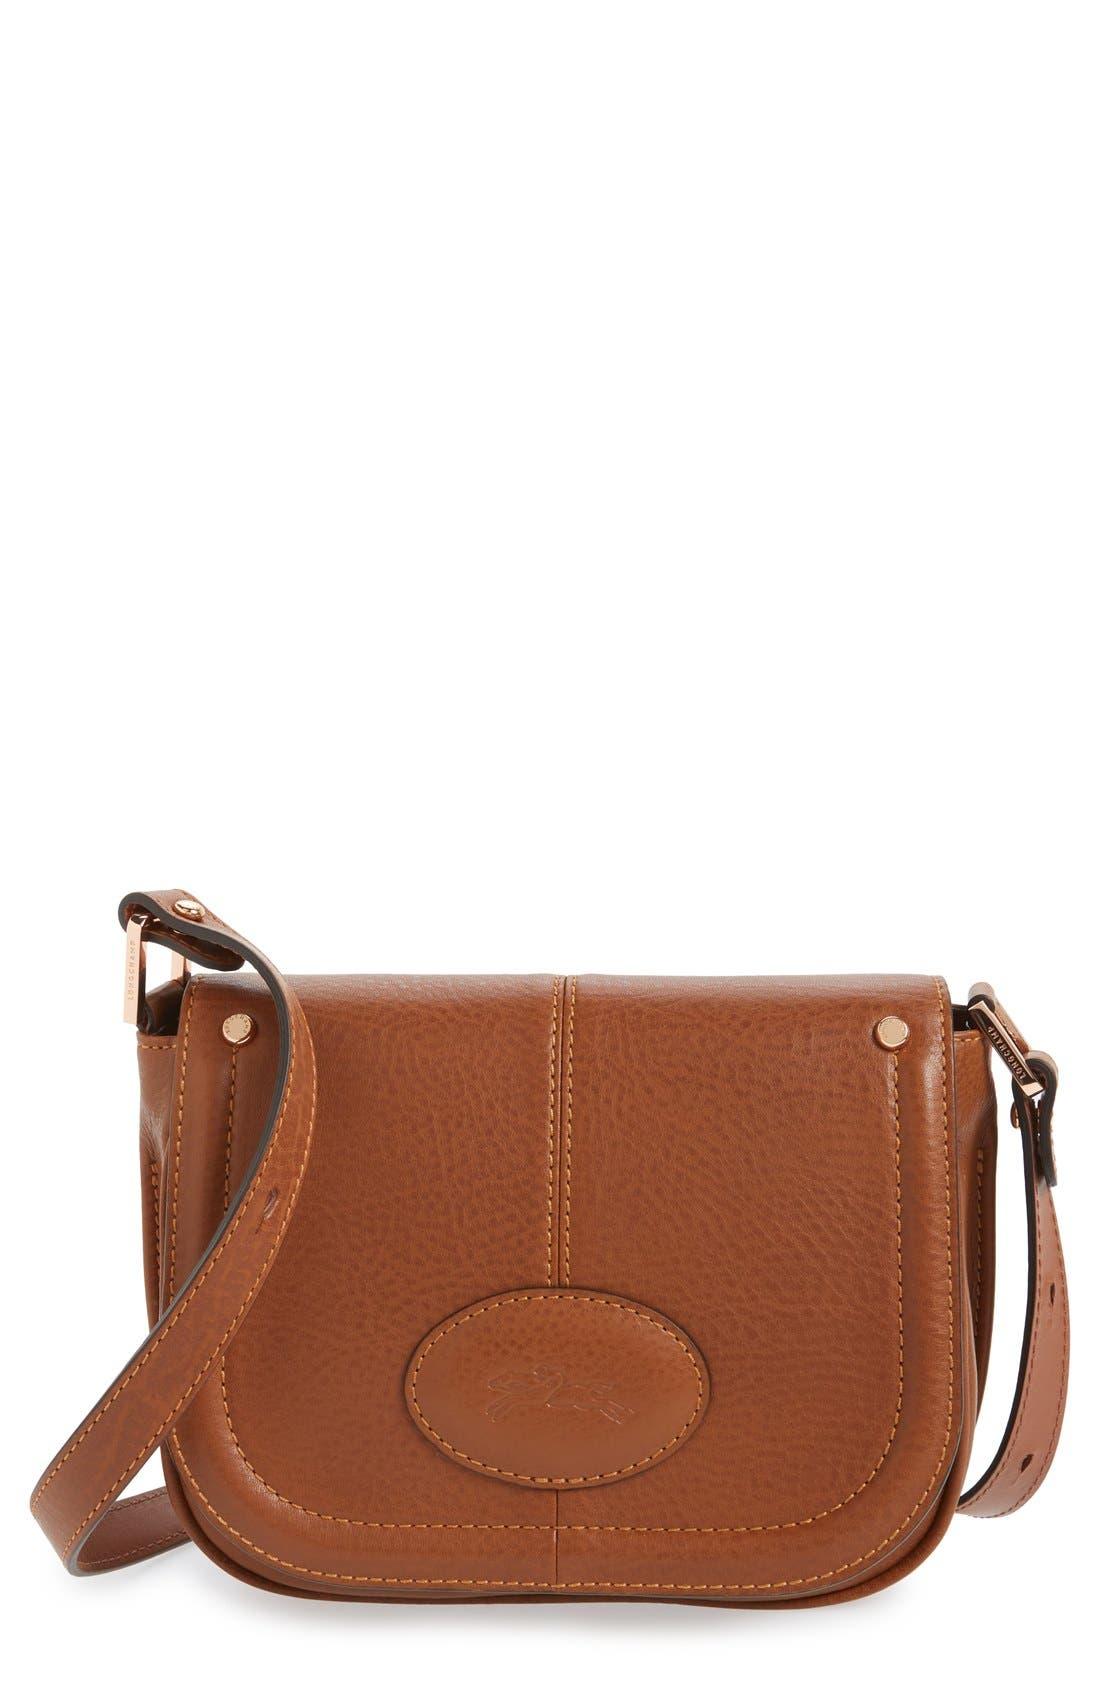 'Small Mystery' Leather Crossbody Bag,                             Main thumbnail 2, color,